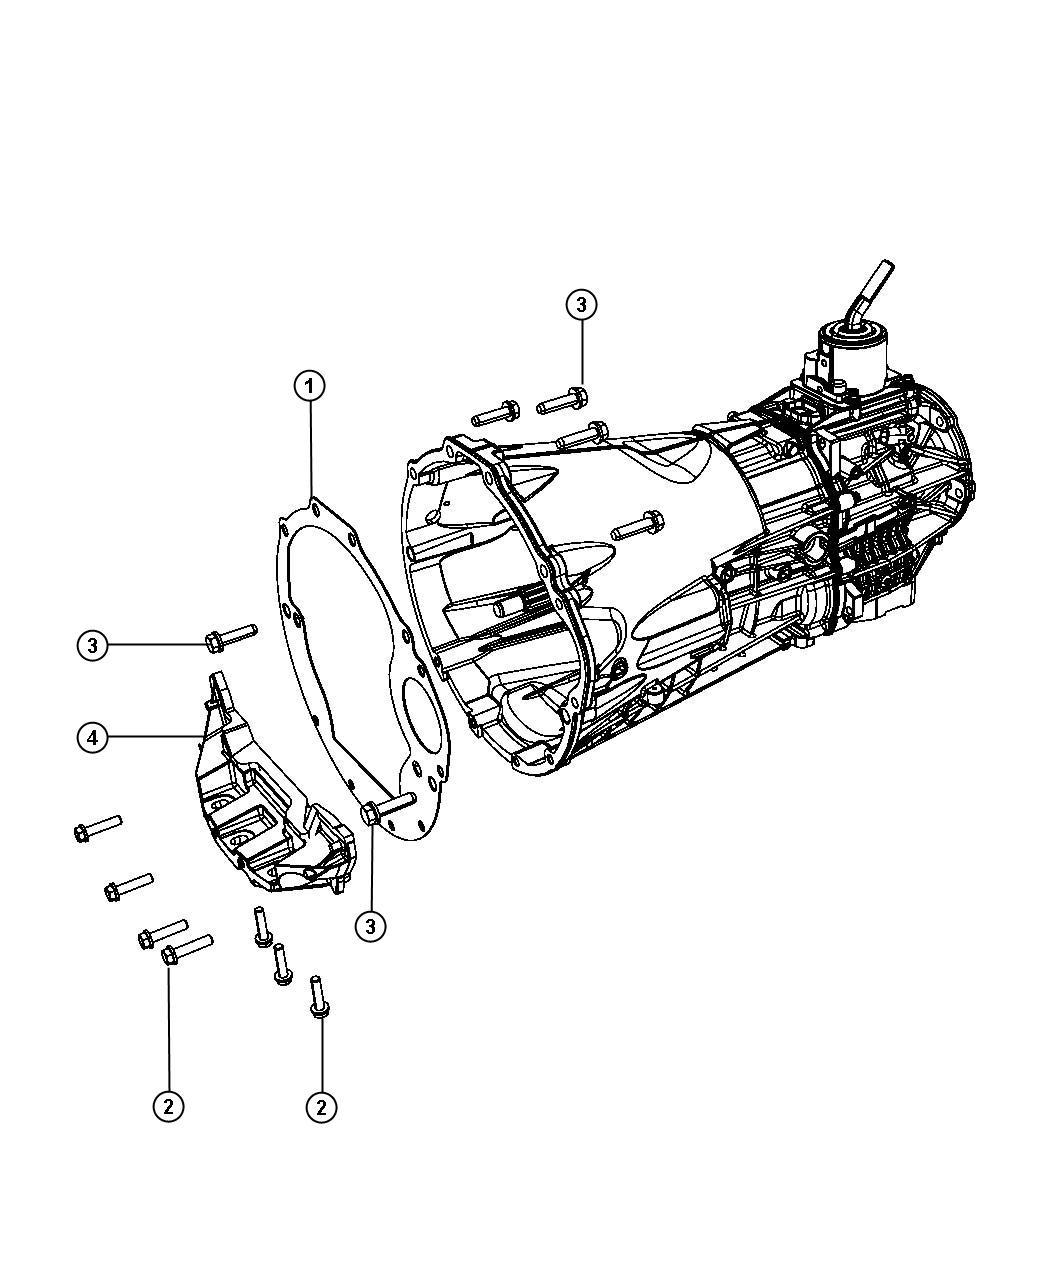 2006 Jeep Wrangler Transmission Wiring Diagram Schematics Engine 2008 X Parts U2022 For 2005